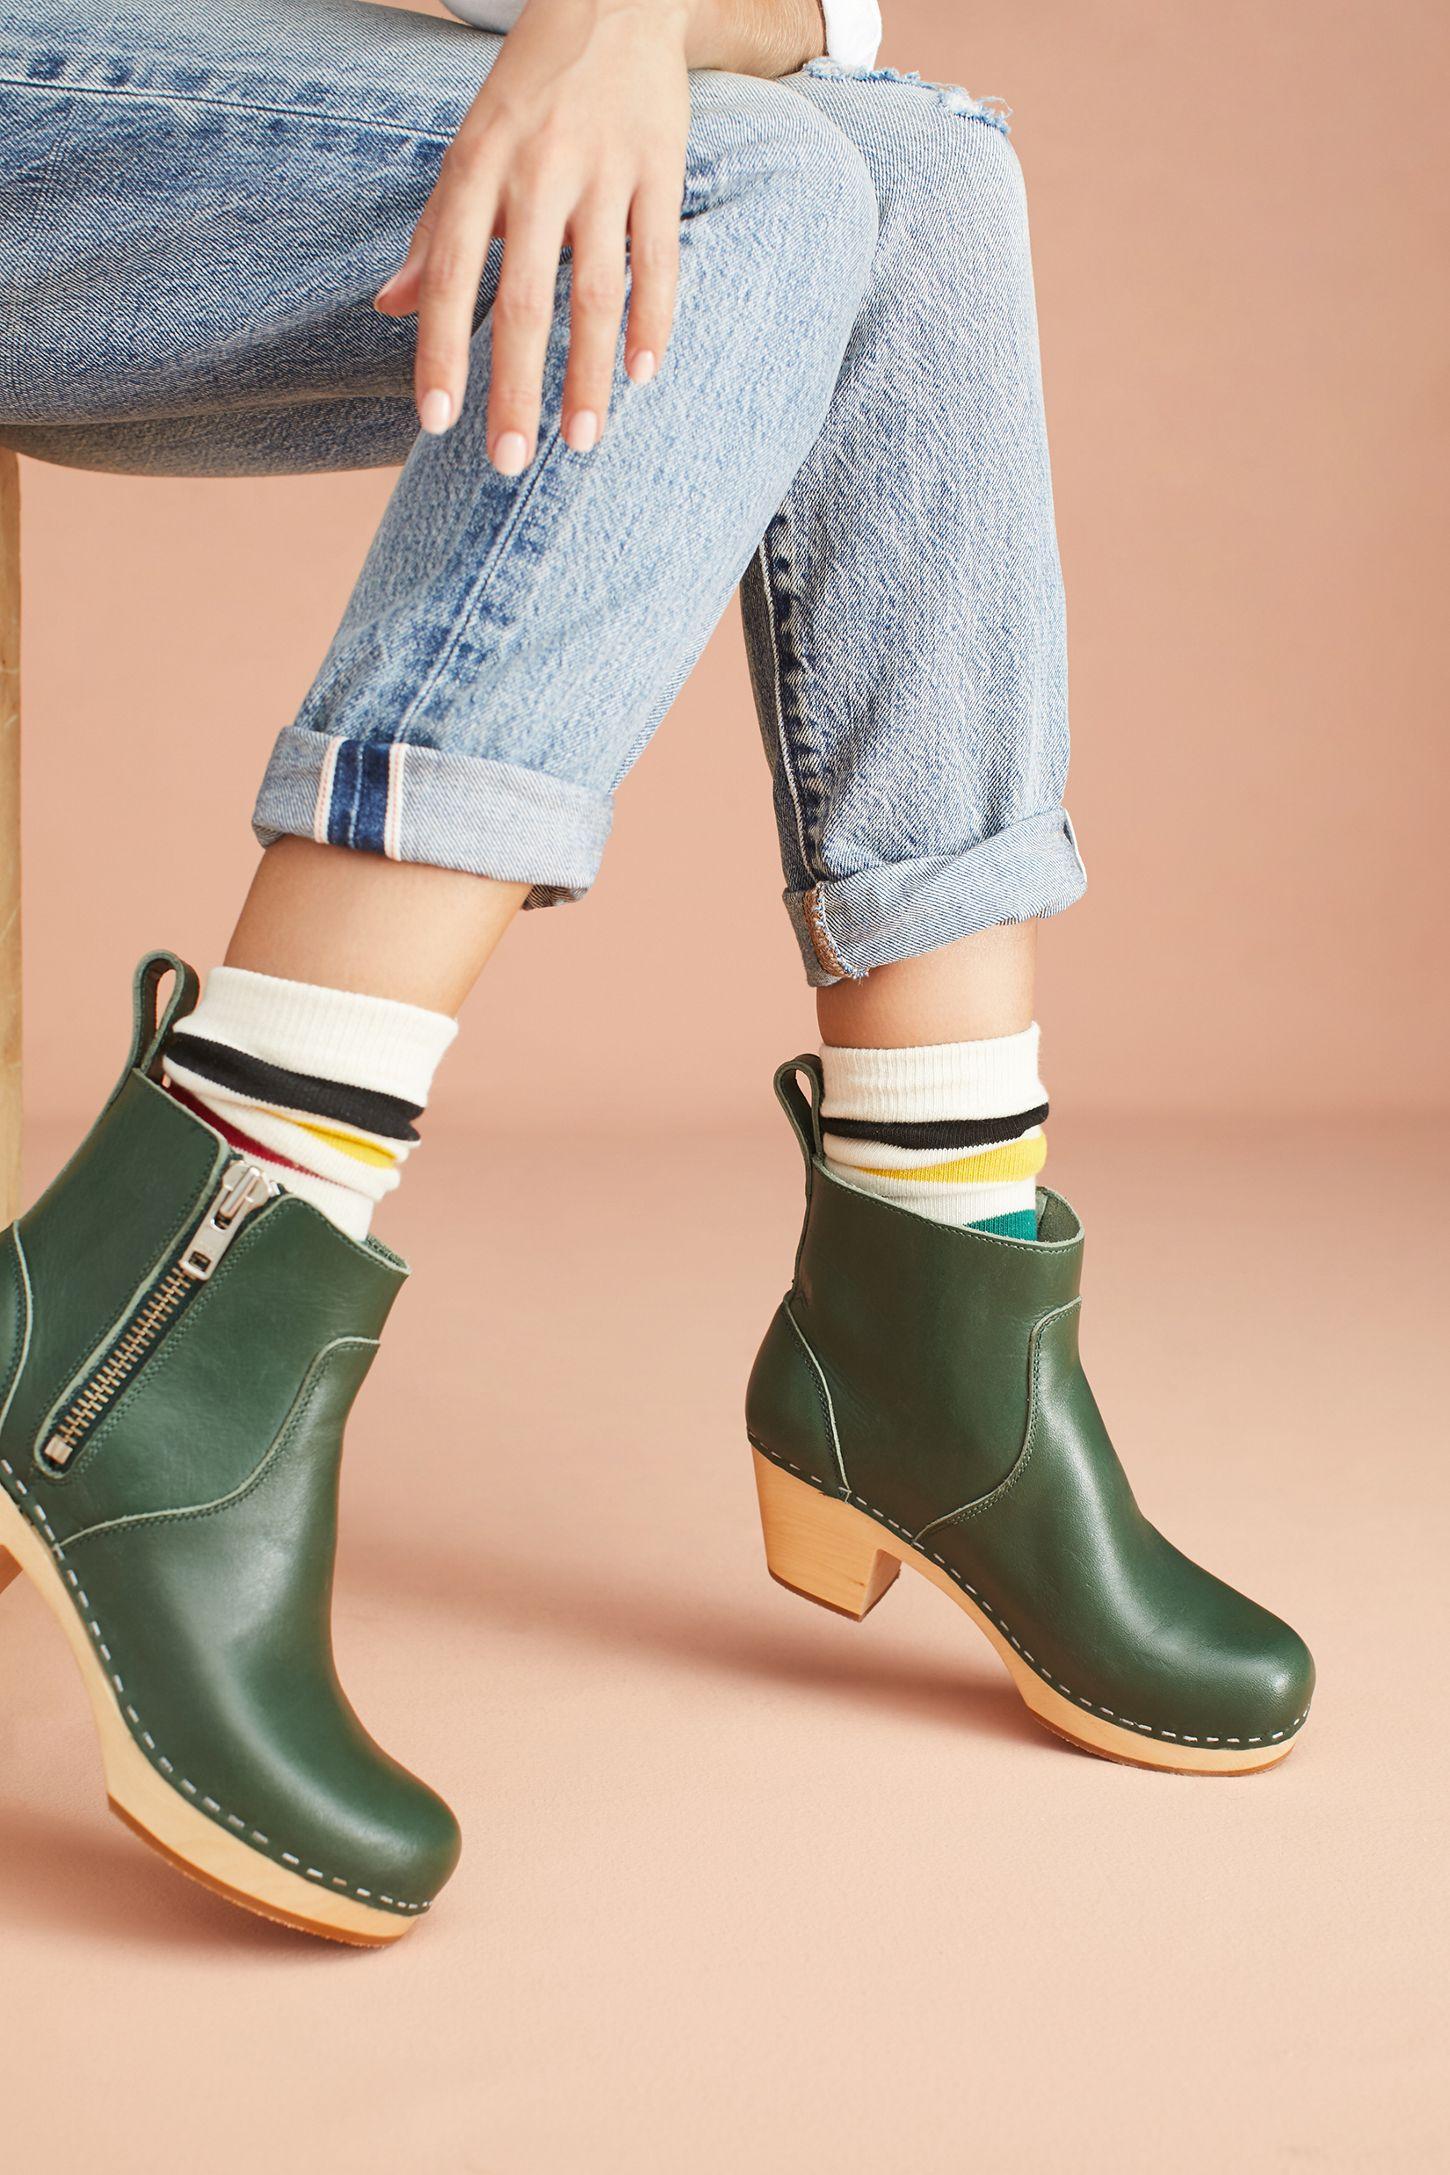 70a42a2c7ad Swedish Hasbeens Zip It Emy Clog Boots